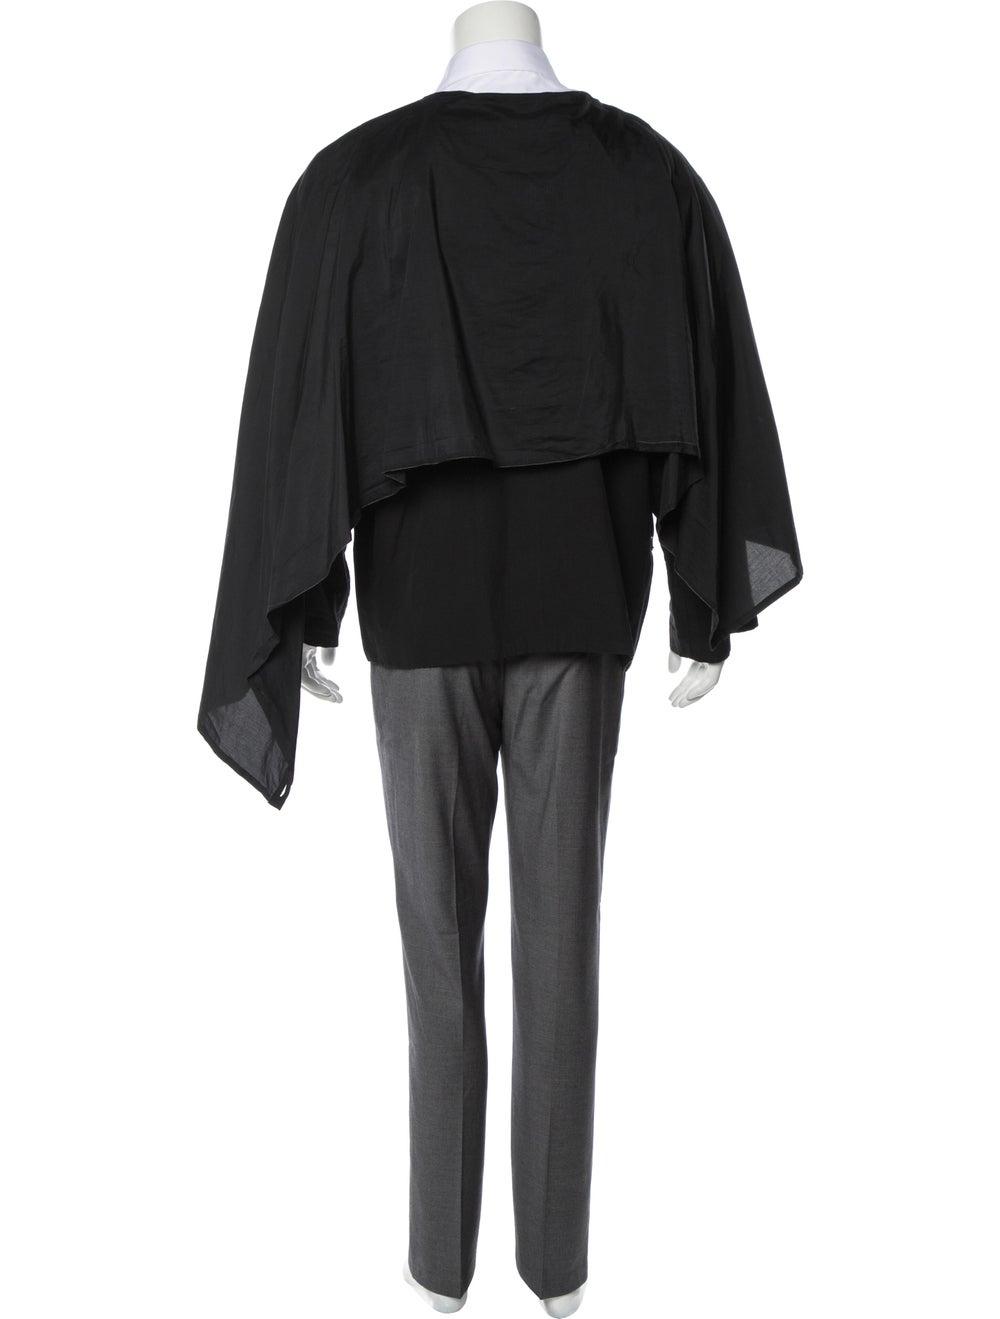 Damir Doma Woven Layered Blazer black - image 3